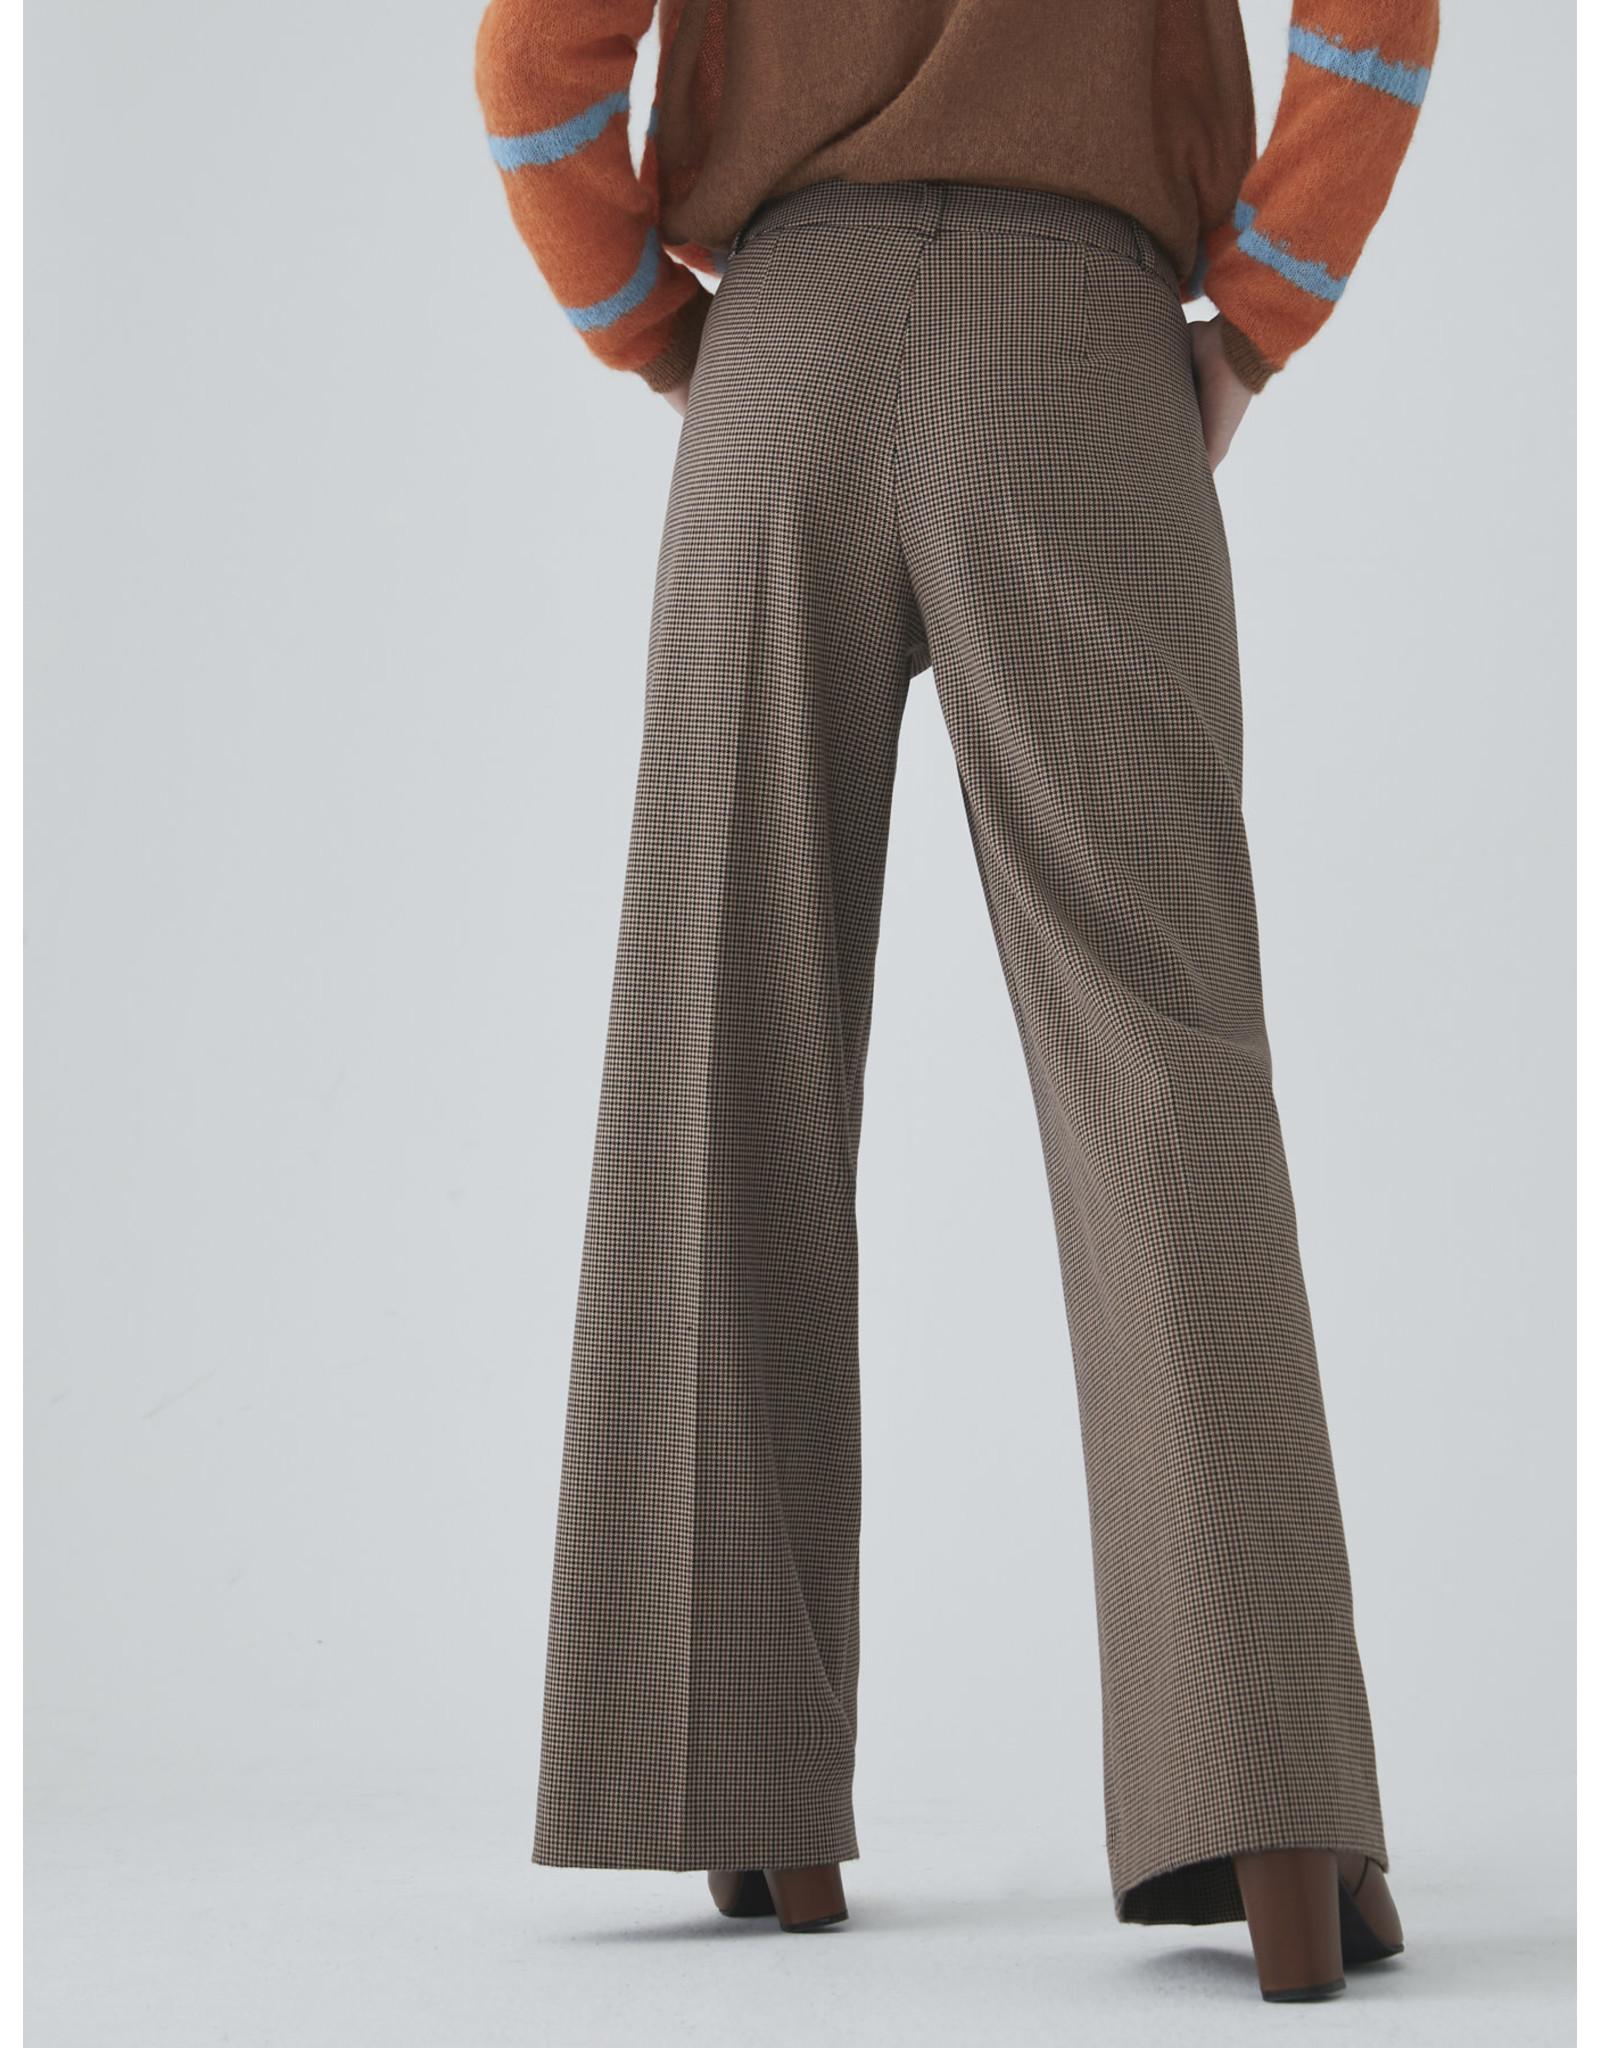 i Blues Falcone Check Trouser